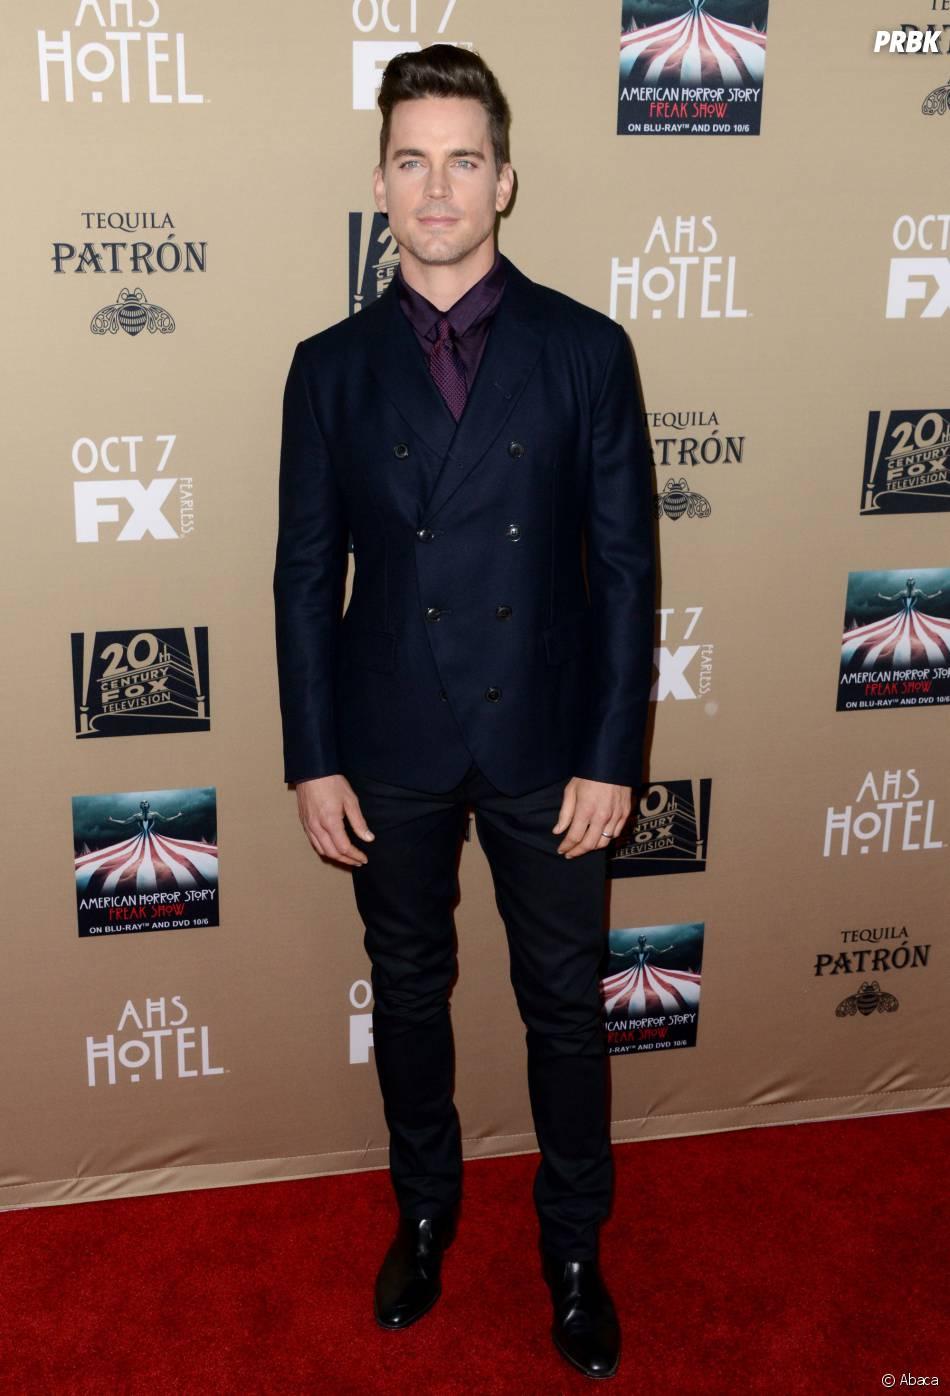 Matt Bomer à l'avant-première de American Horror Story : Hotel à Los Angeles le 3 octobre 2015